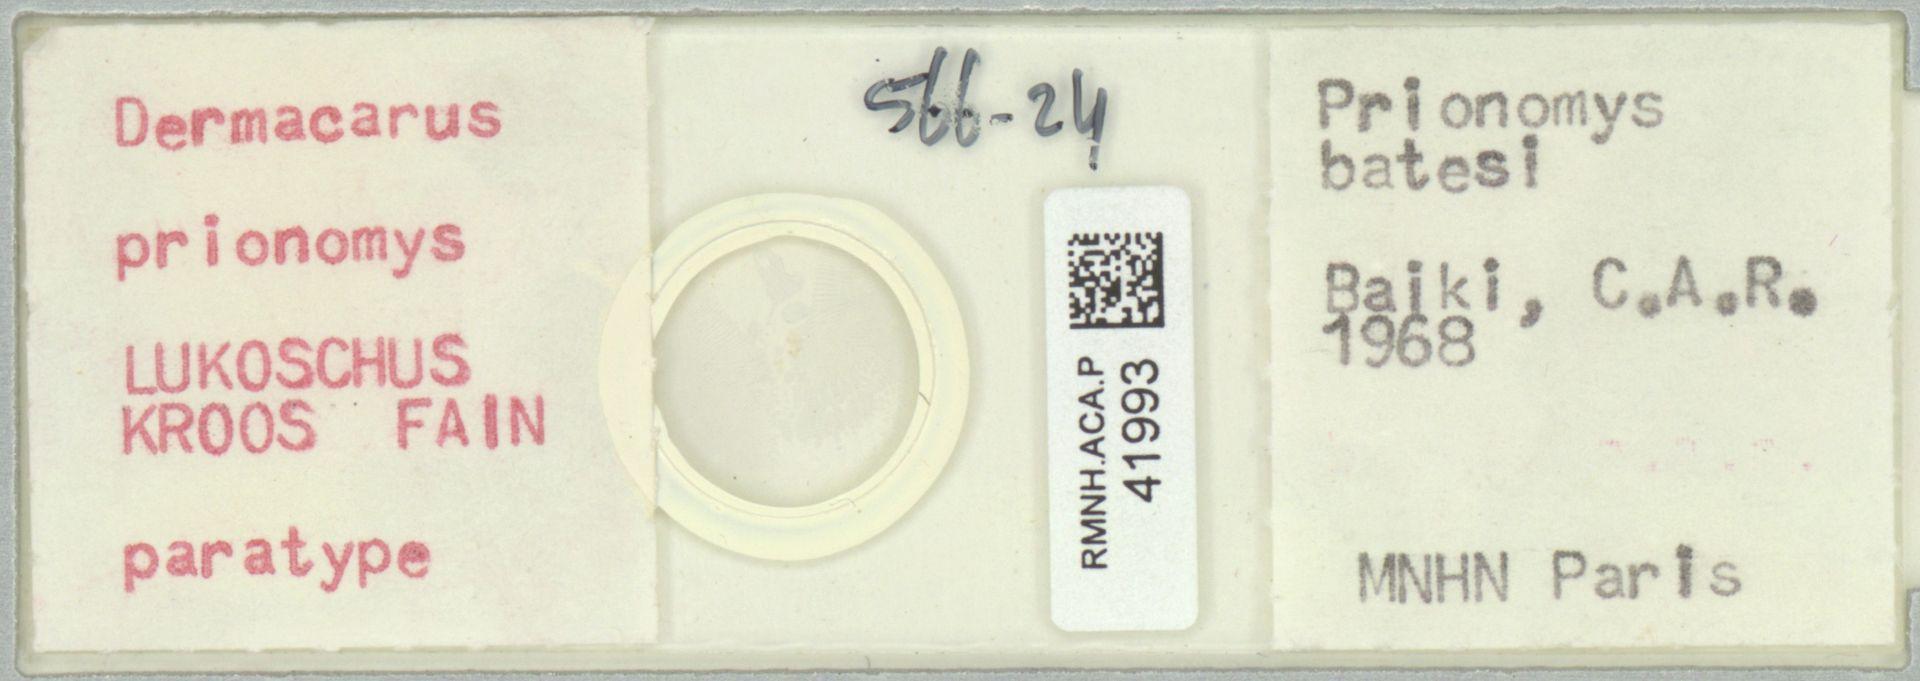 RMNH.ACA.P.41993 | Dermacarus prionomys Lukoschus, Kroos, Fain